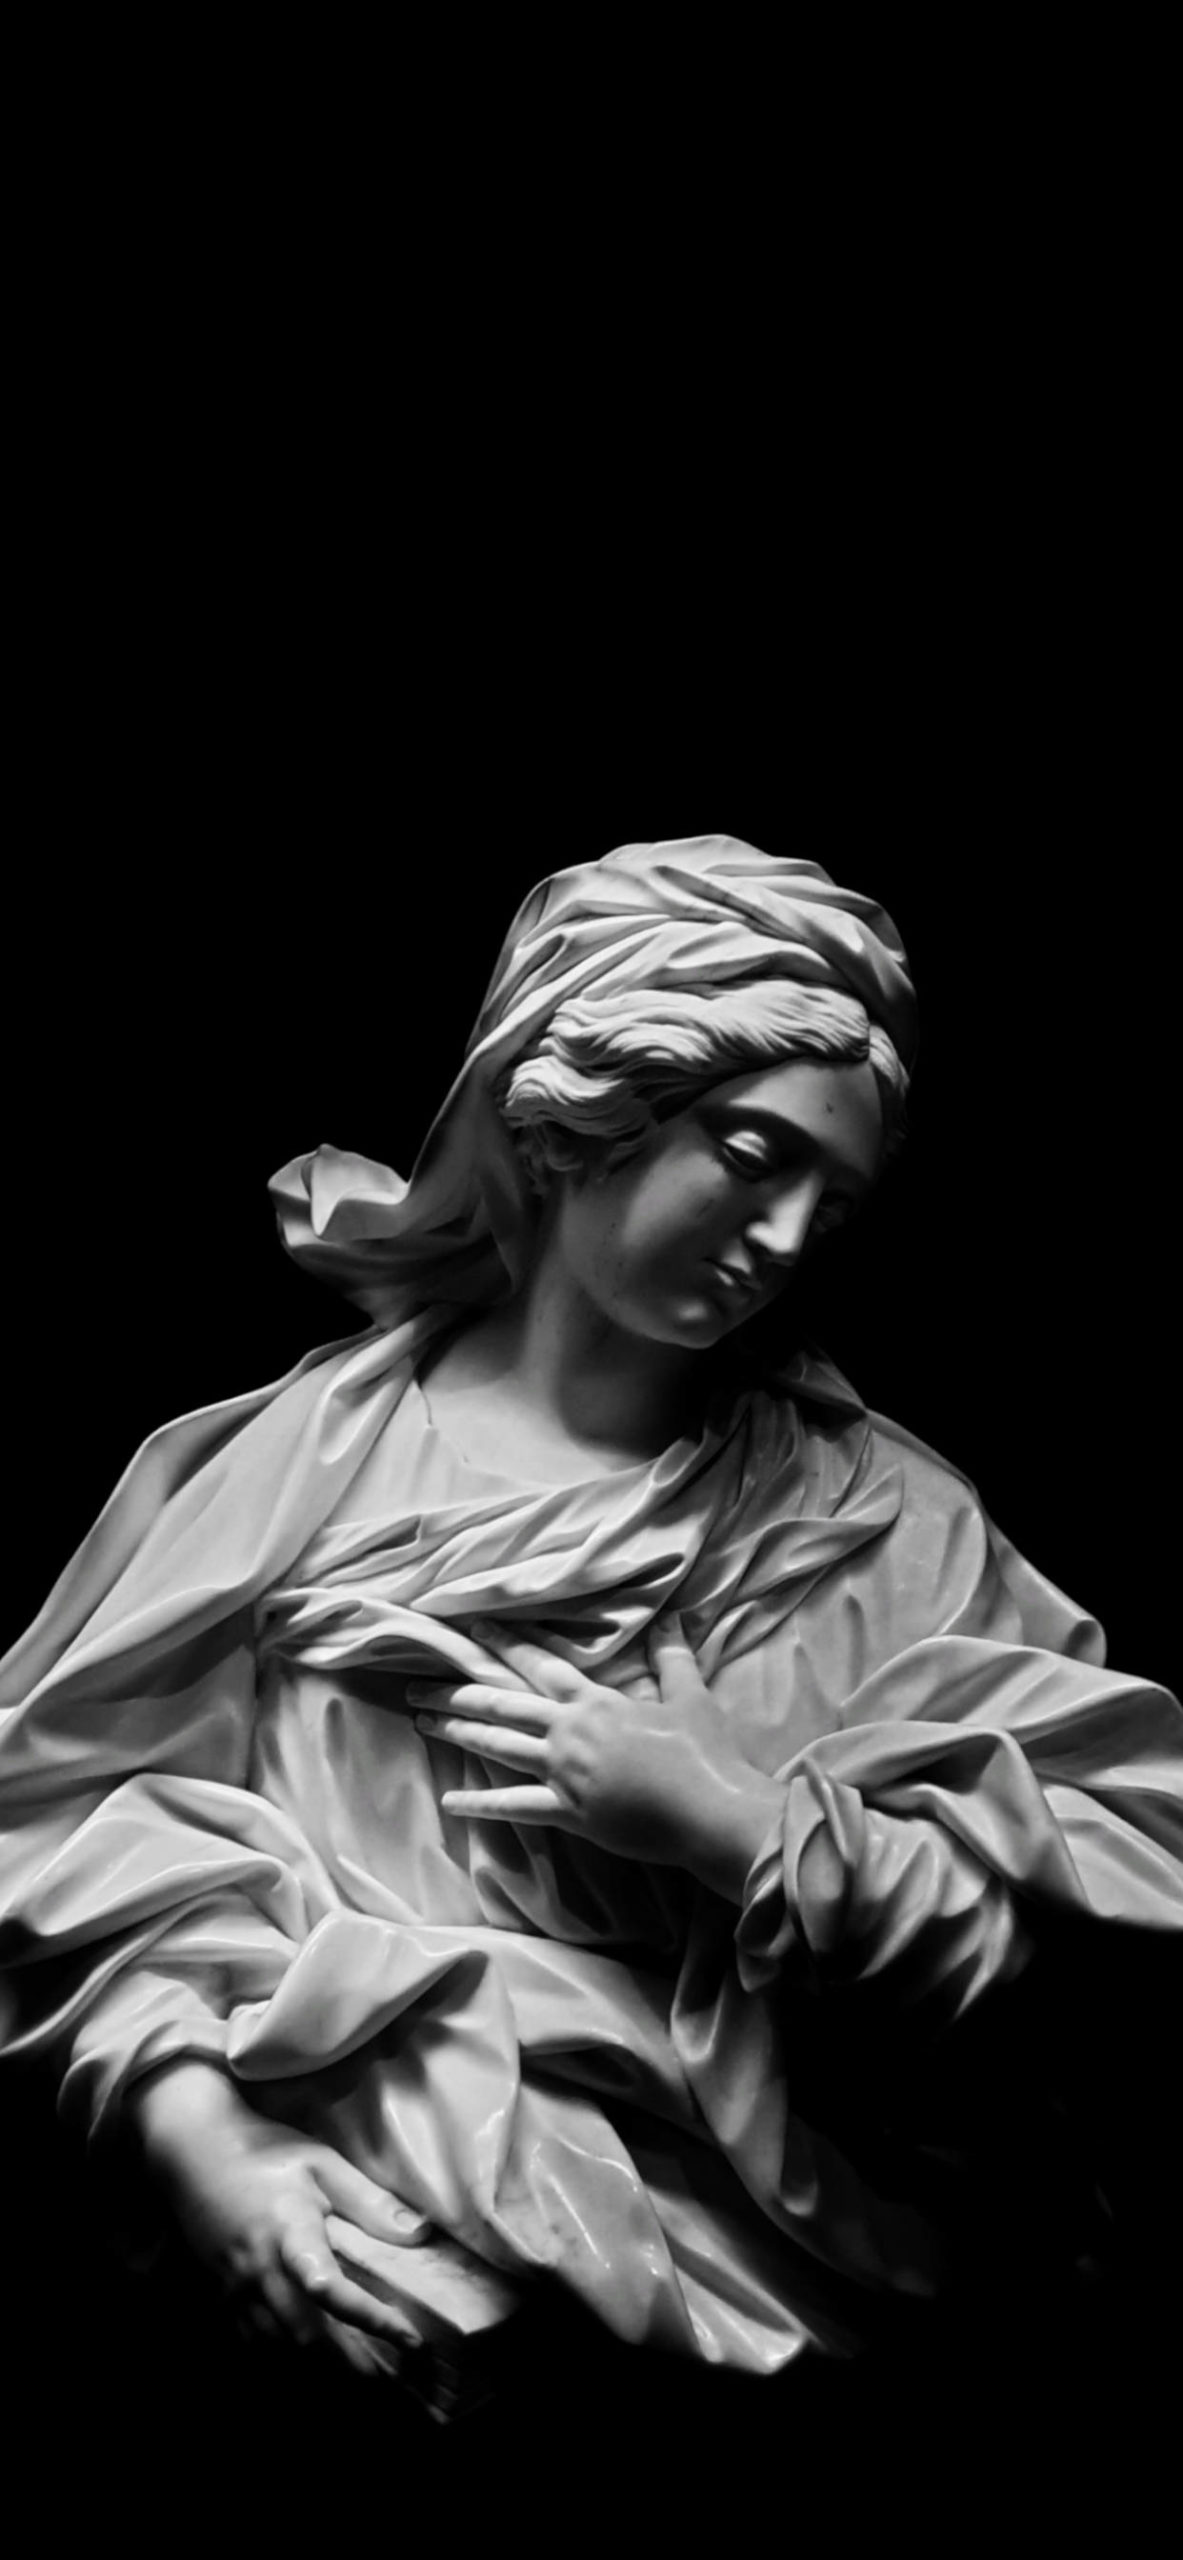 iPhone wallpapers sculpture women scaled Sculpture